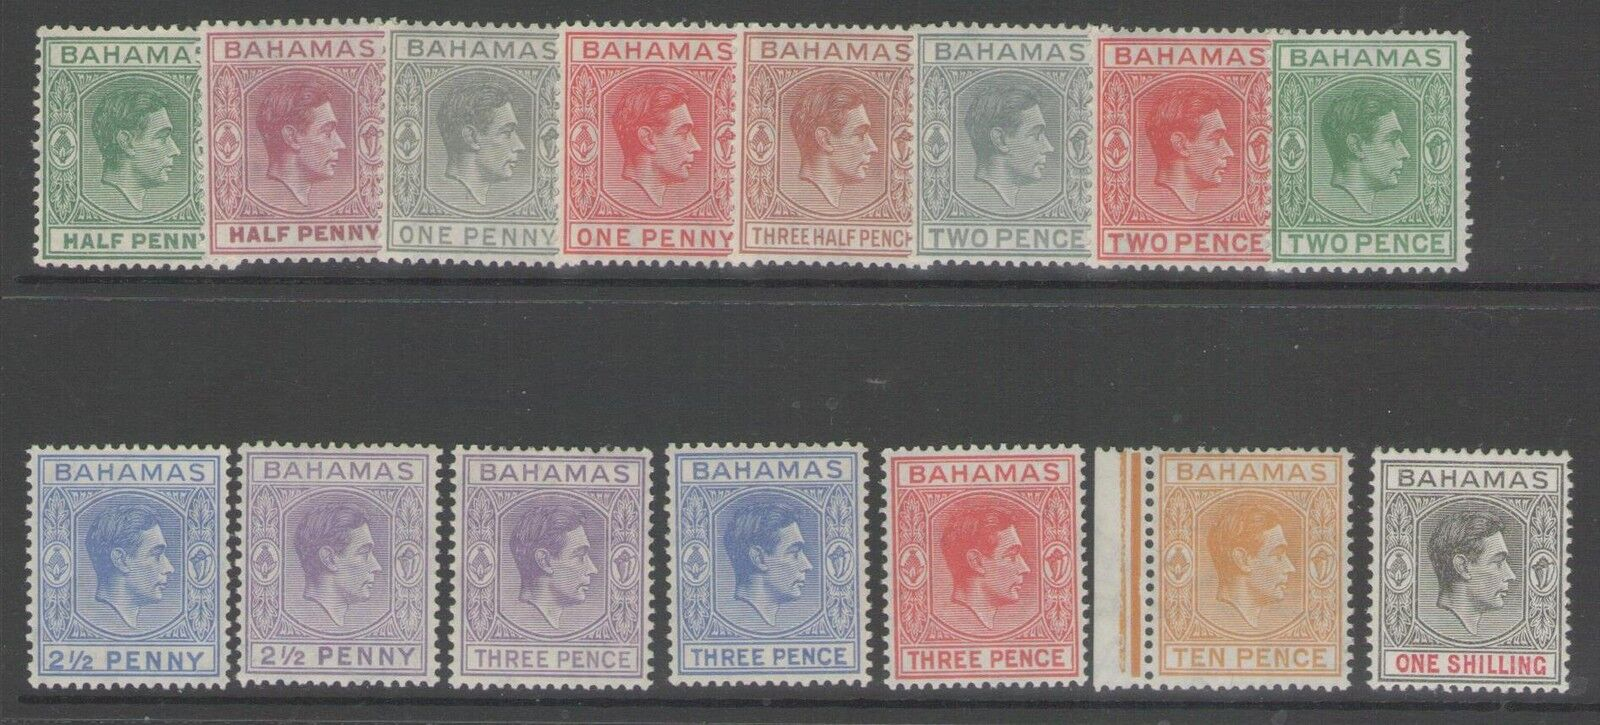 BAHAMAS SG149/55c 1938 DEFINITIVE SET TO 1/= MTD MINT